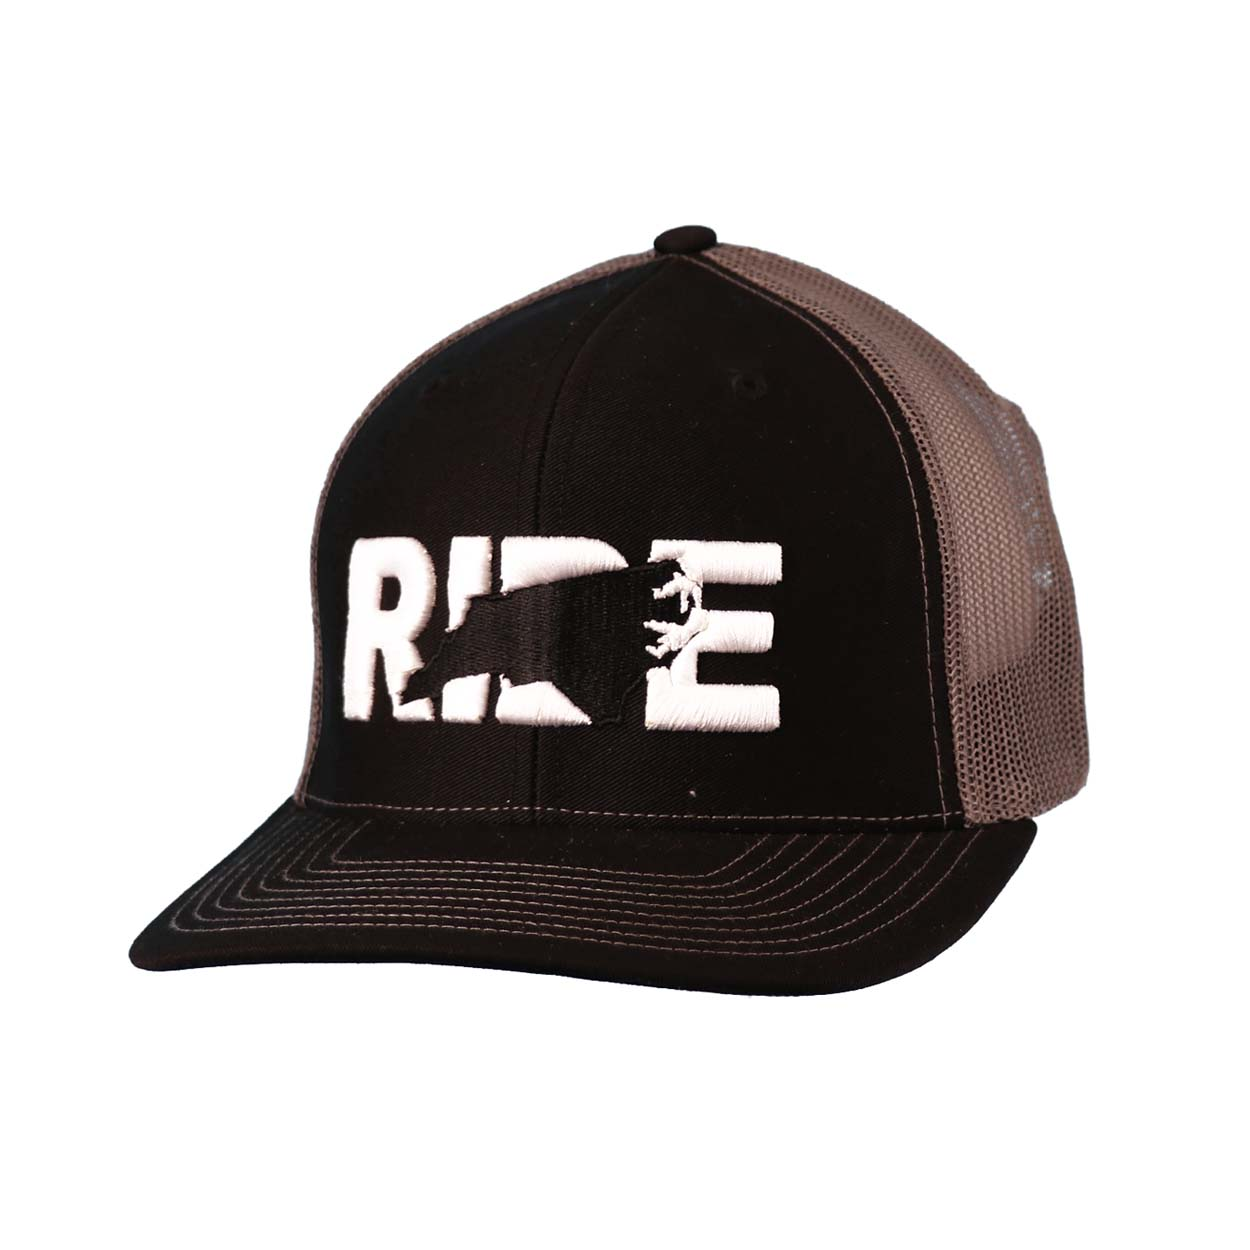 Ride North Carolina Classic Embroidered Snapback Trucker Hat Black/White